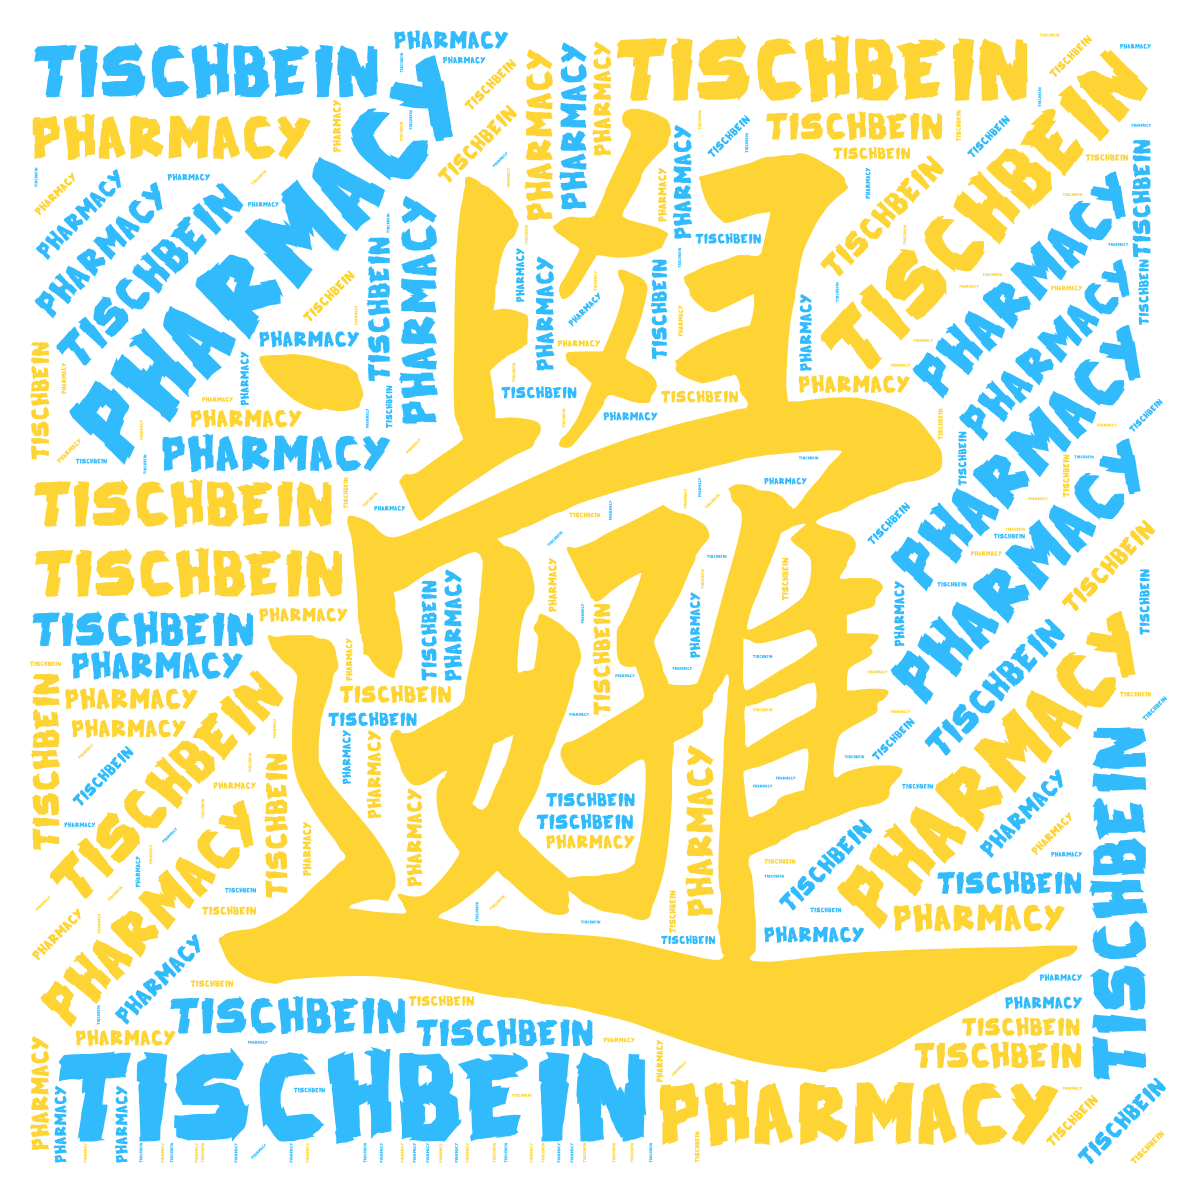 Tischbein Pharmacy